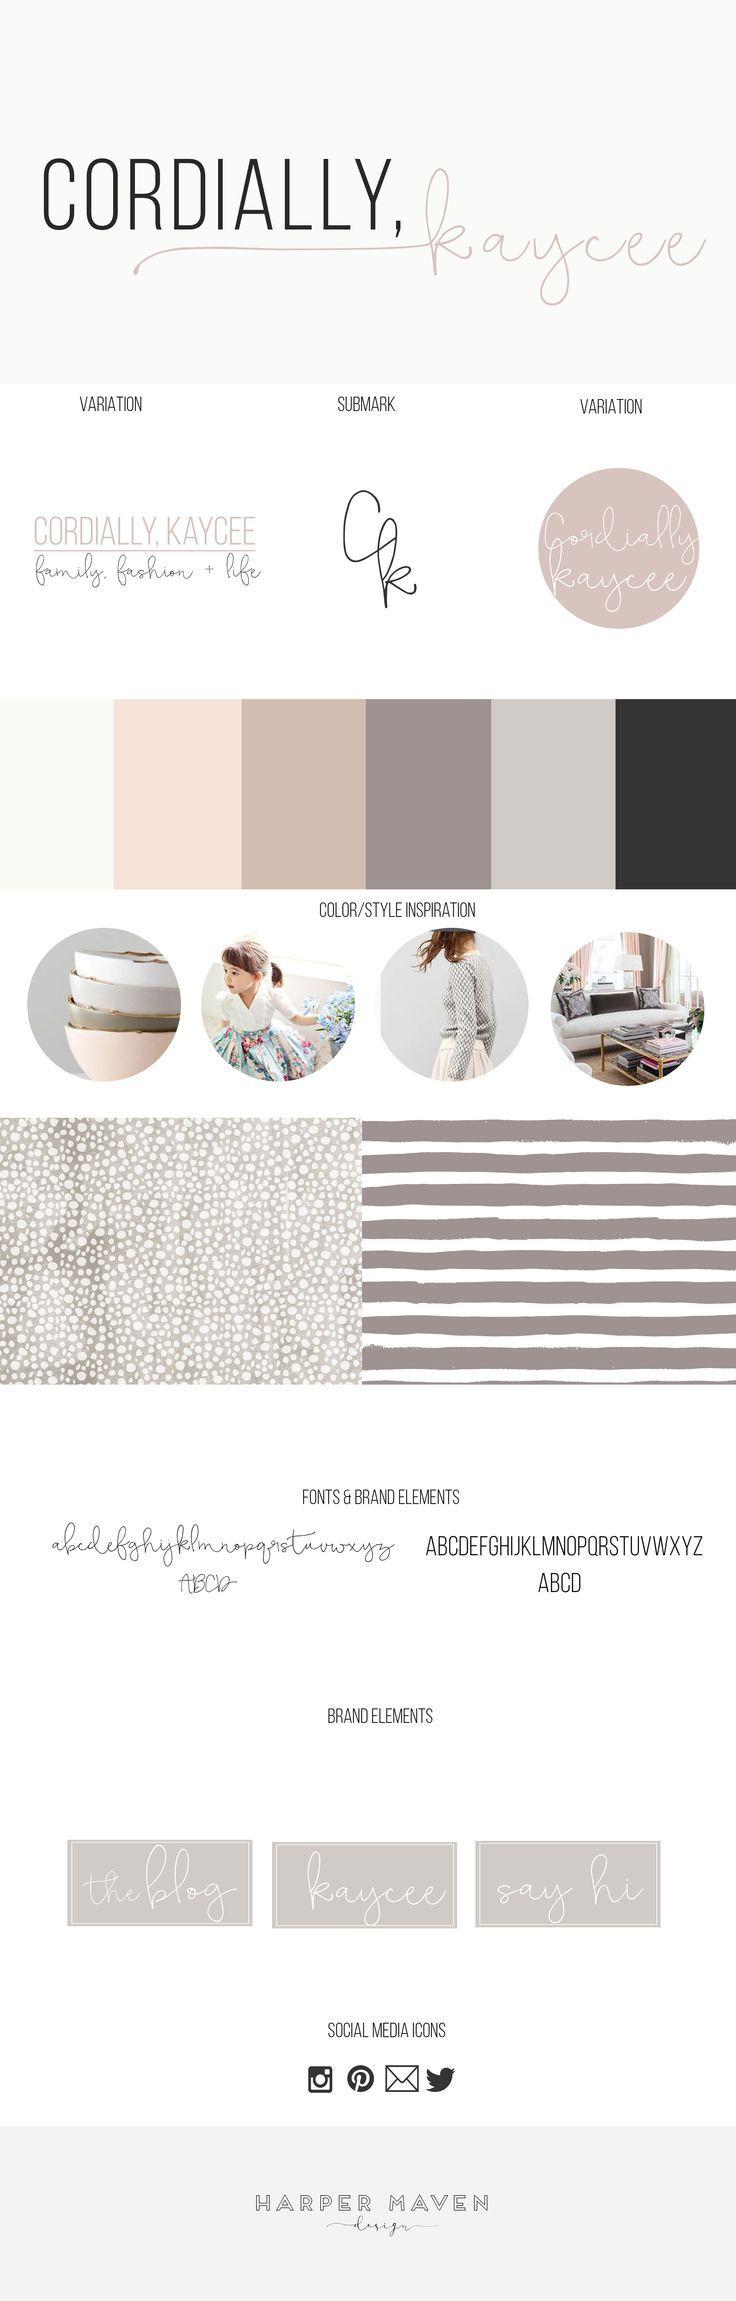 Cordially, Kaycee Brand Design by Harper Maven Design   http://www.harpermavendesign.com